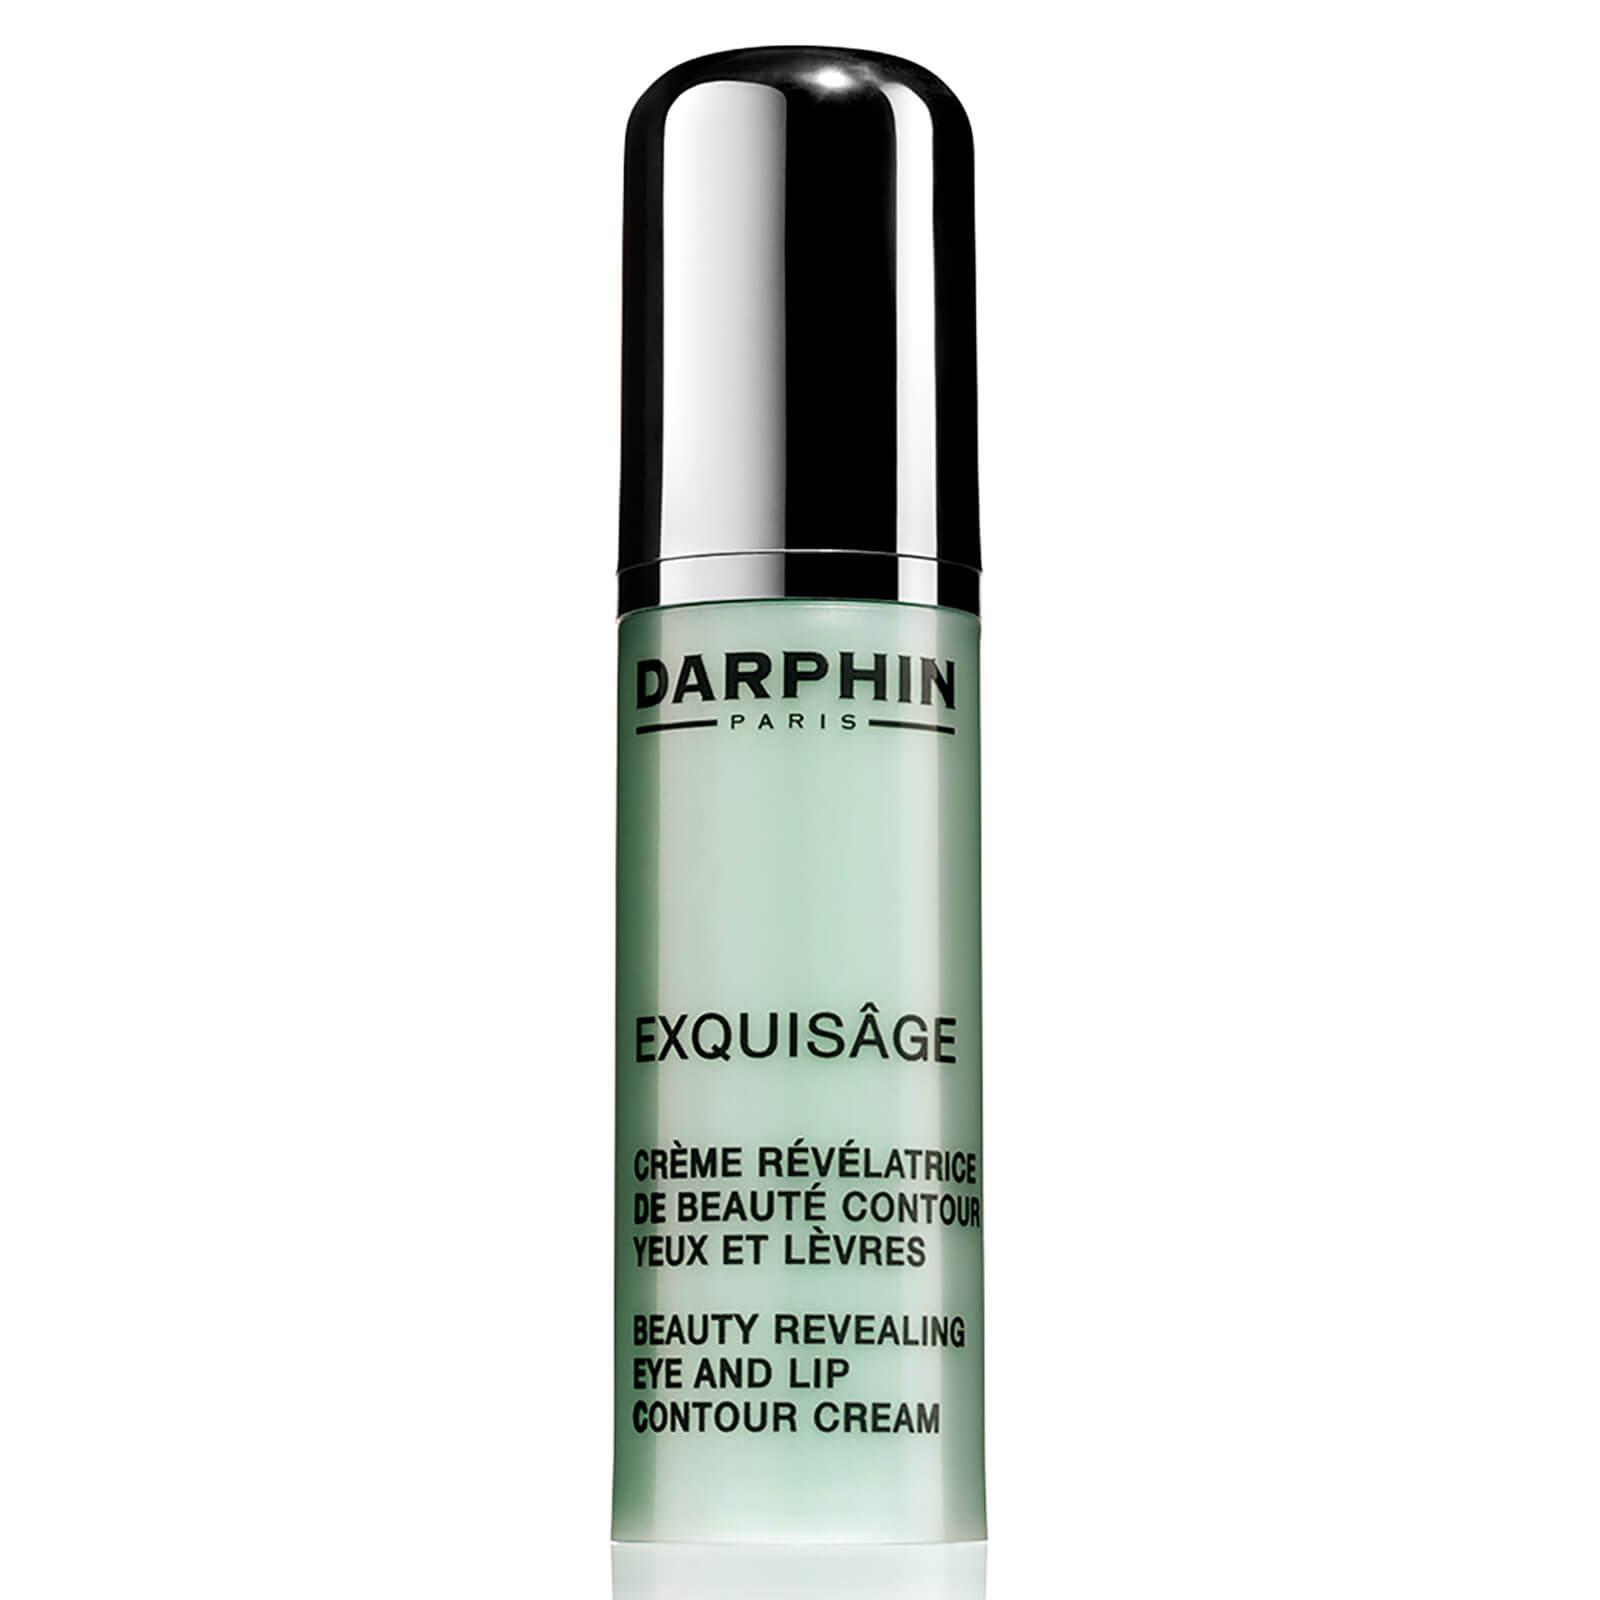 Darphin Exquisage Beauty Revealing Eye and Lip Cream